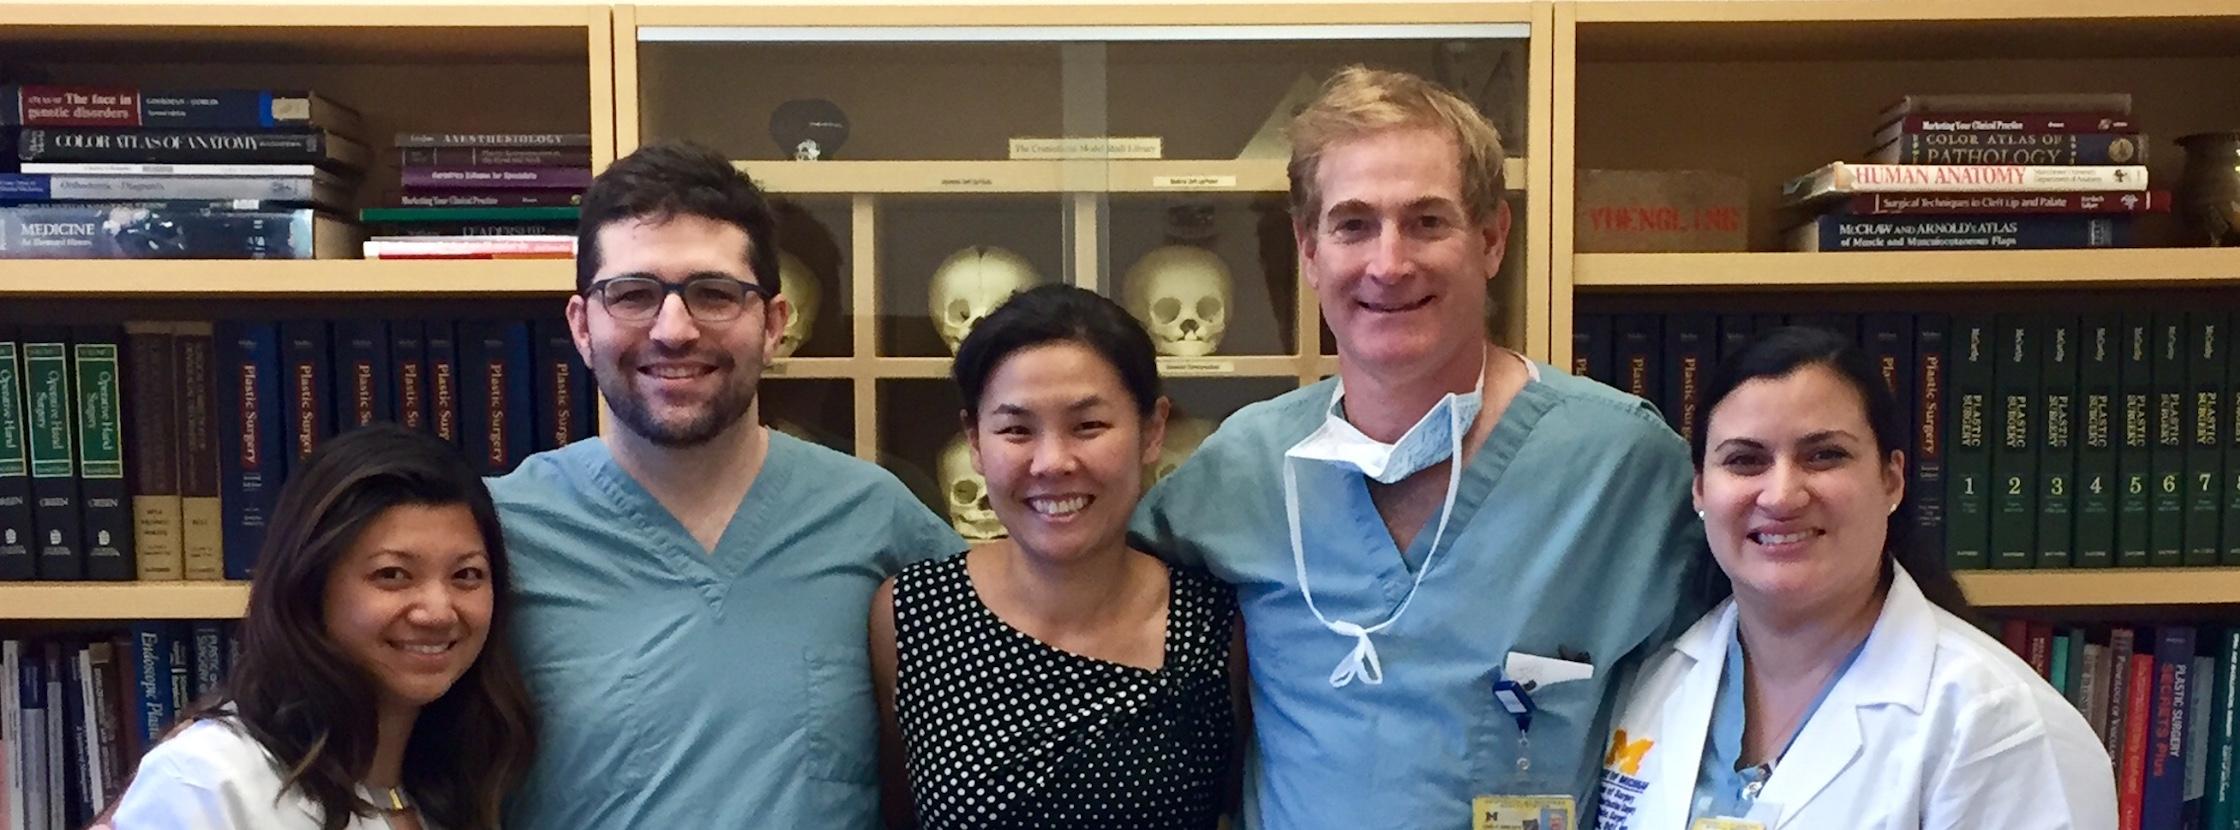 Plastic Surgery team members